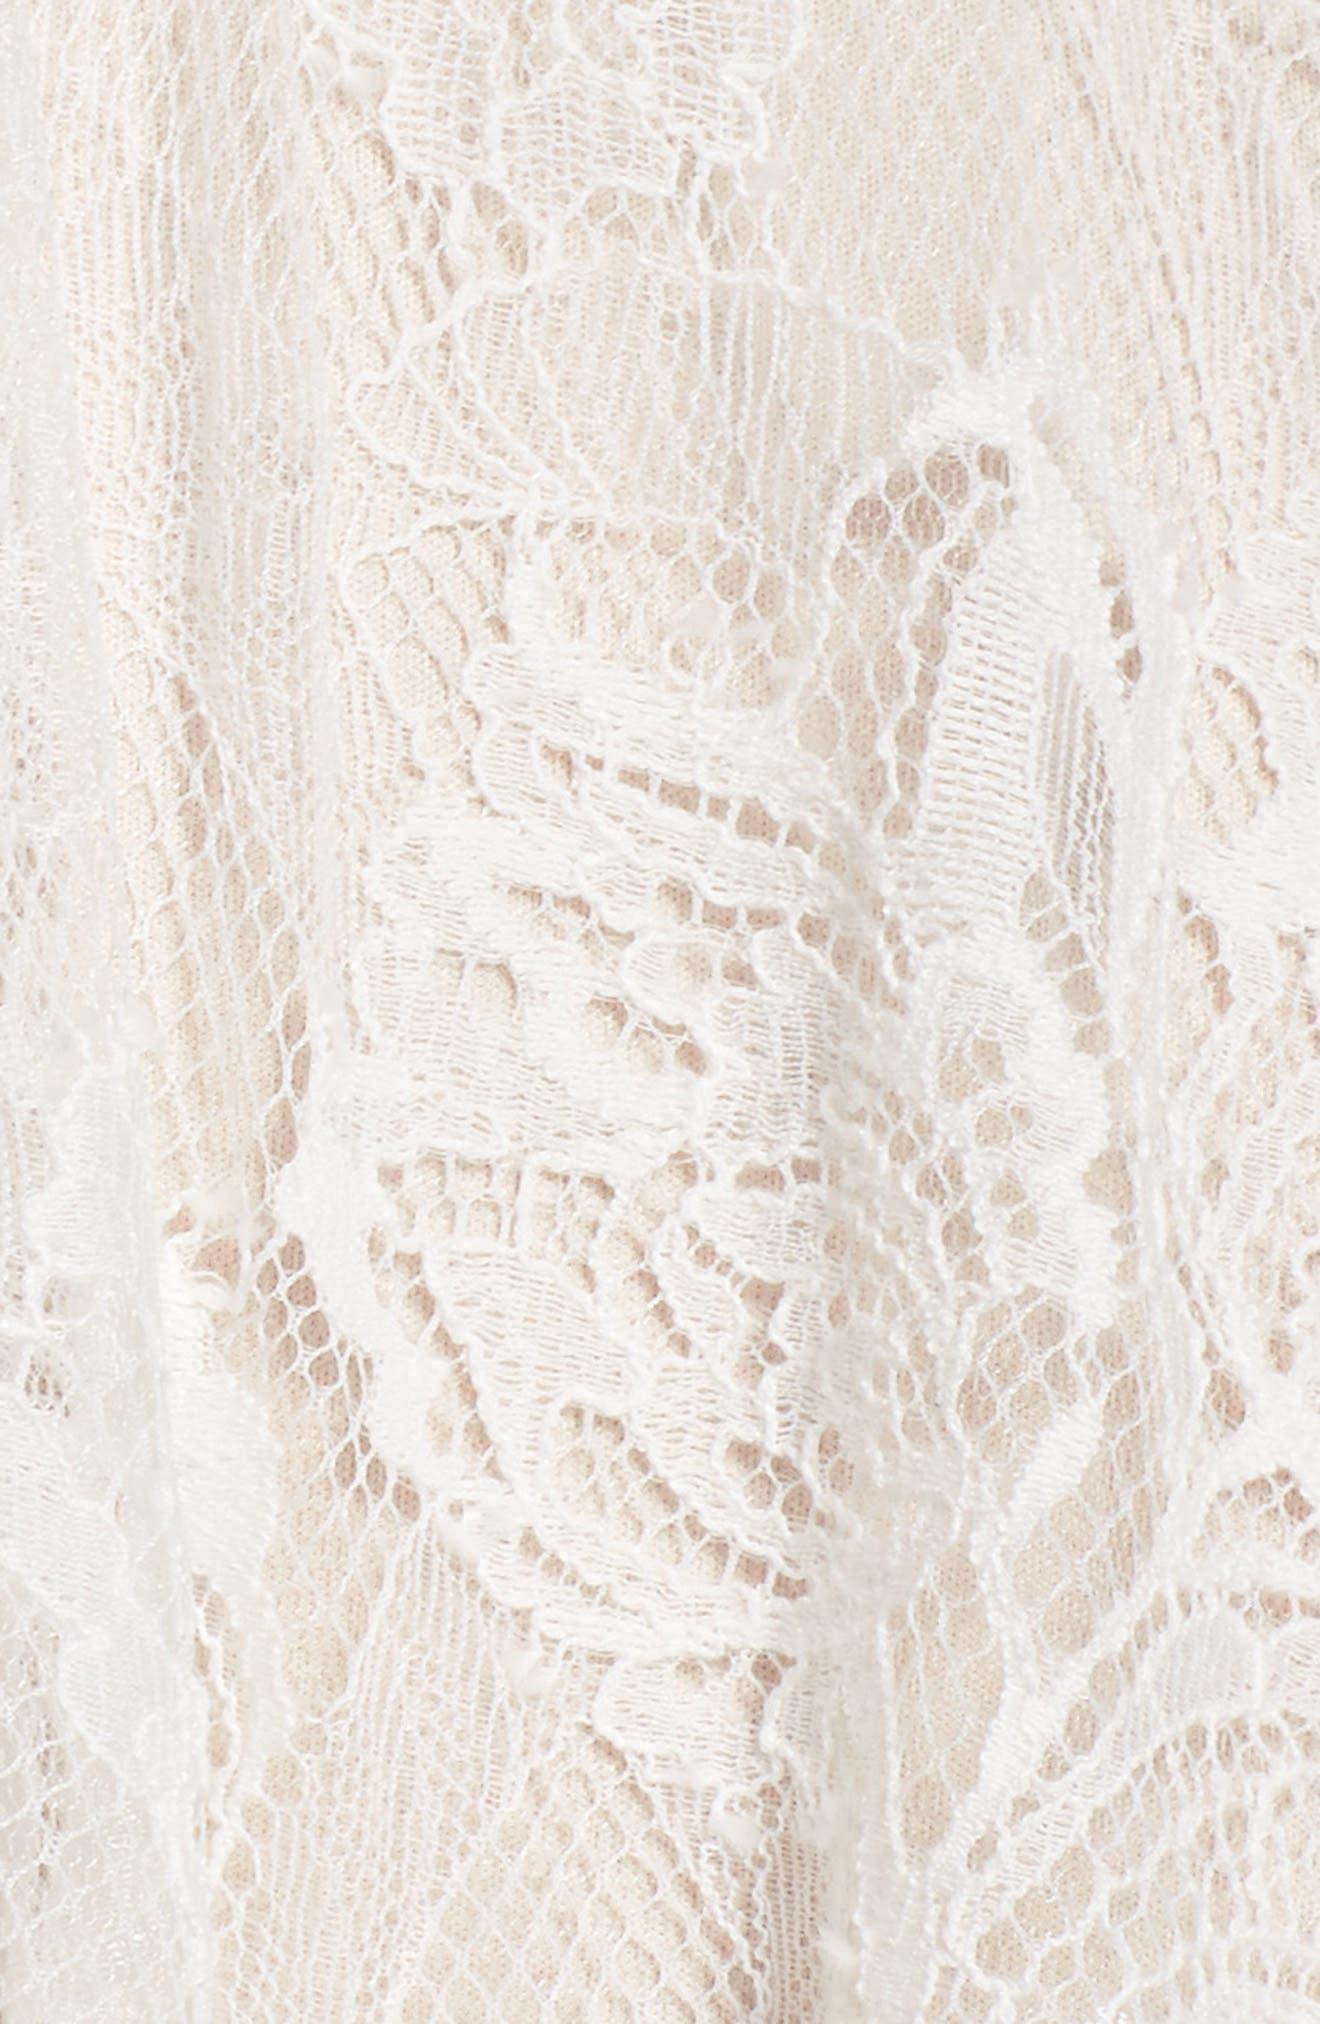 Lace Tea-Length Dress,                             Alternate thumbnail 5, color,                             Ivory/ Petal